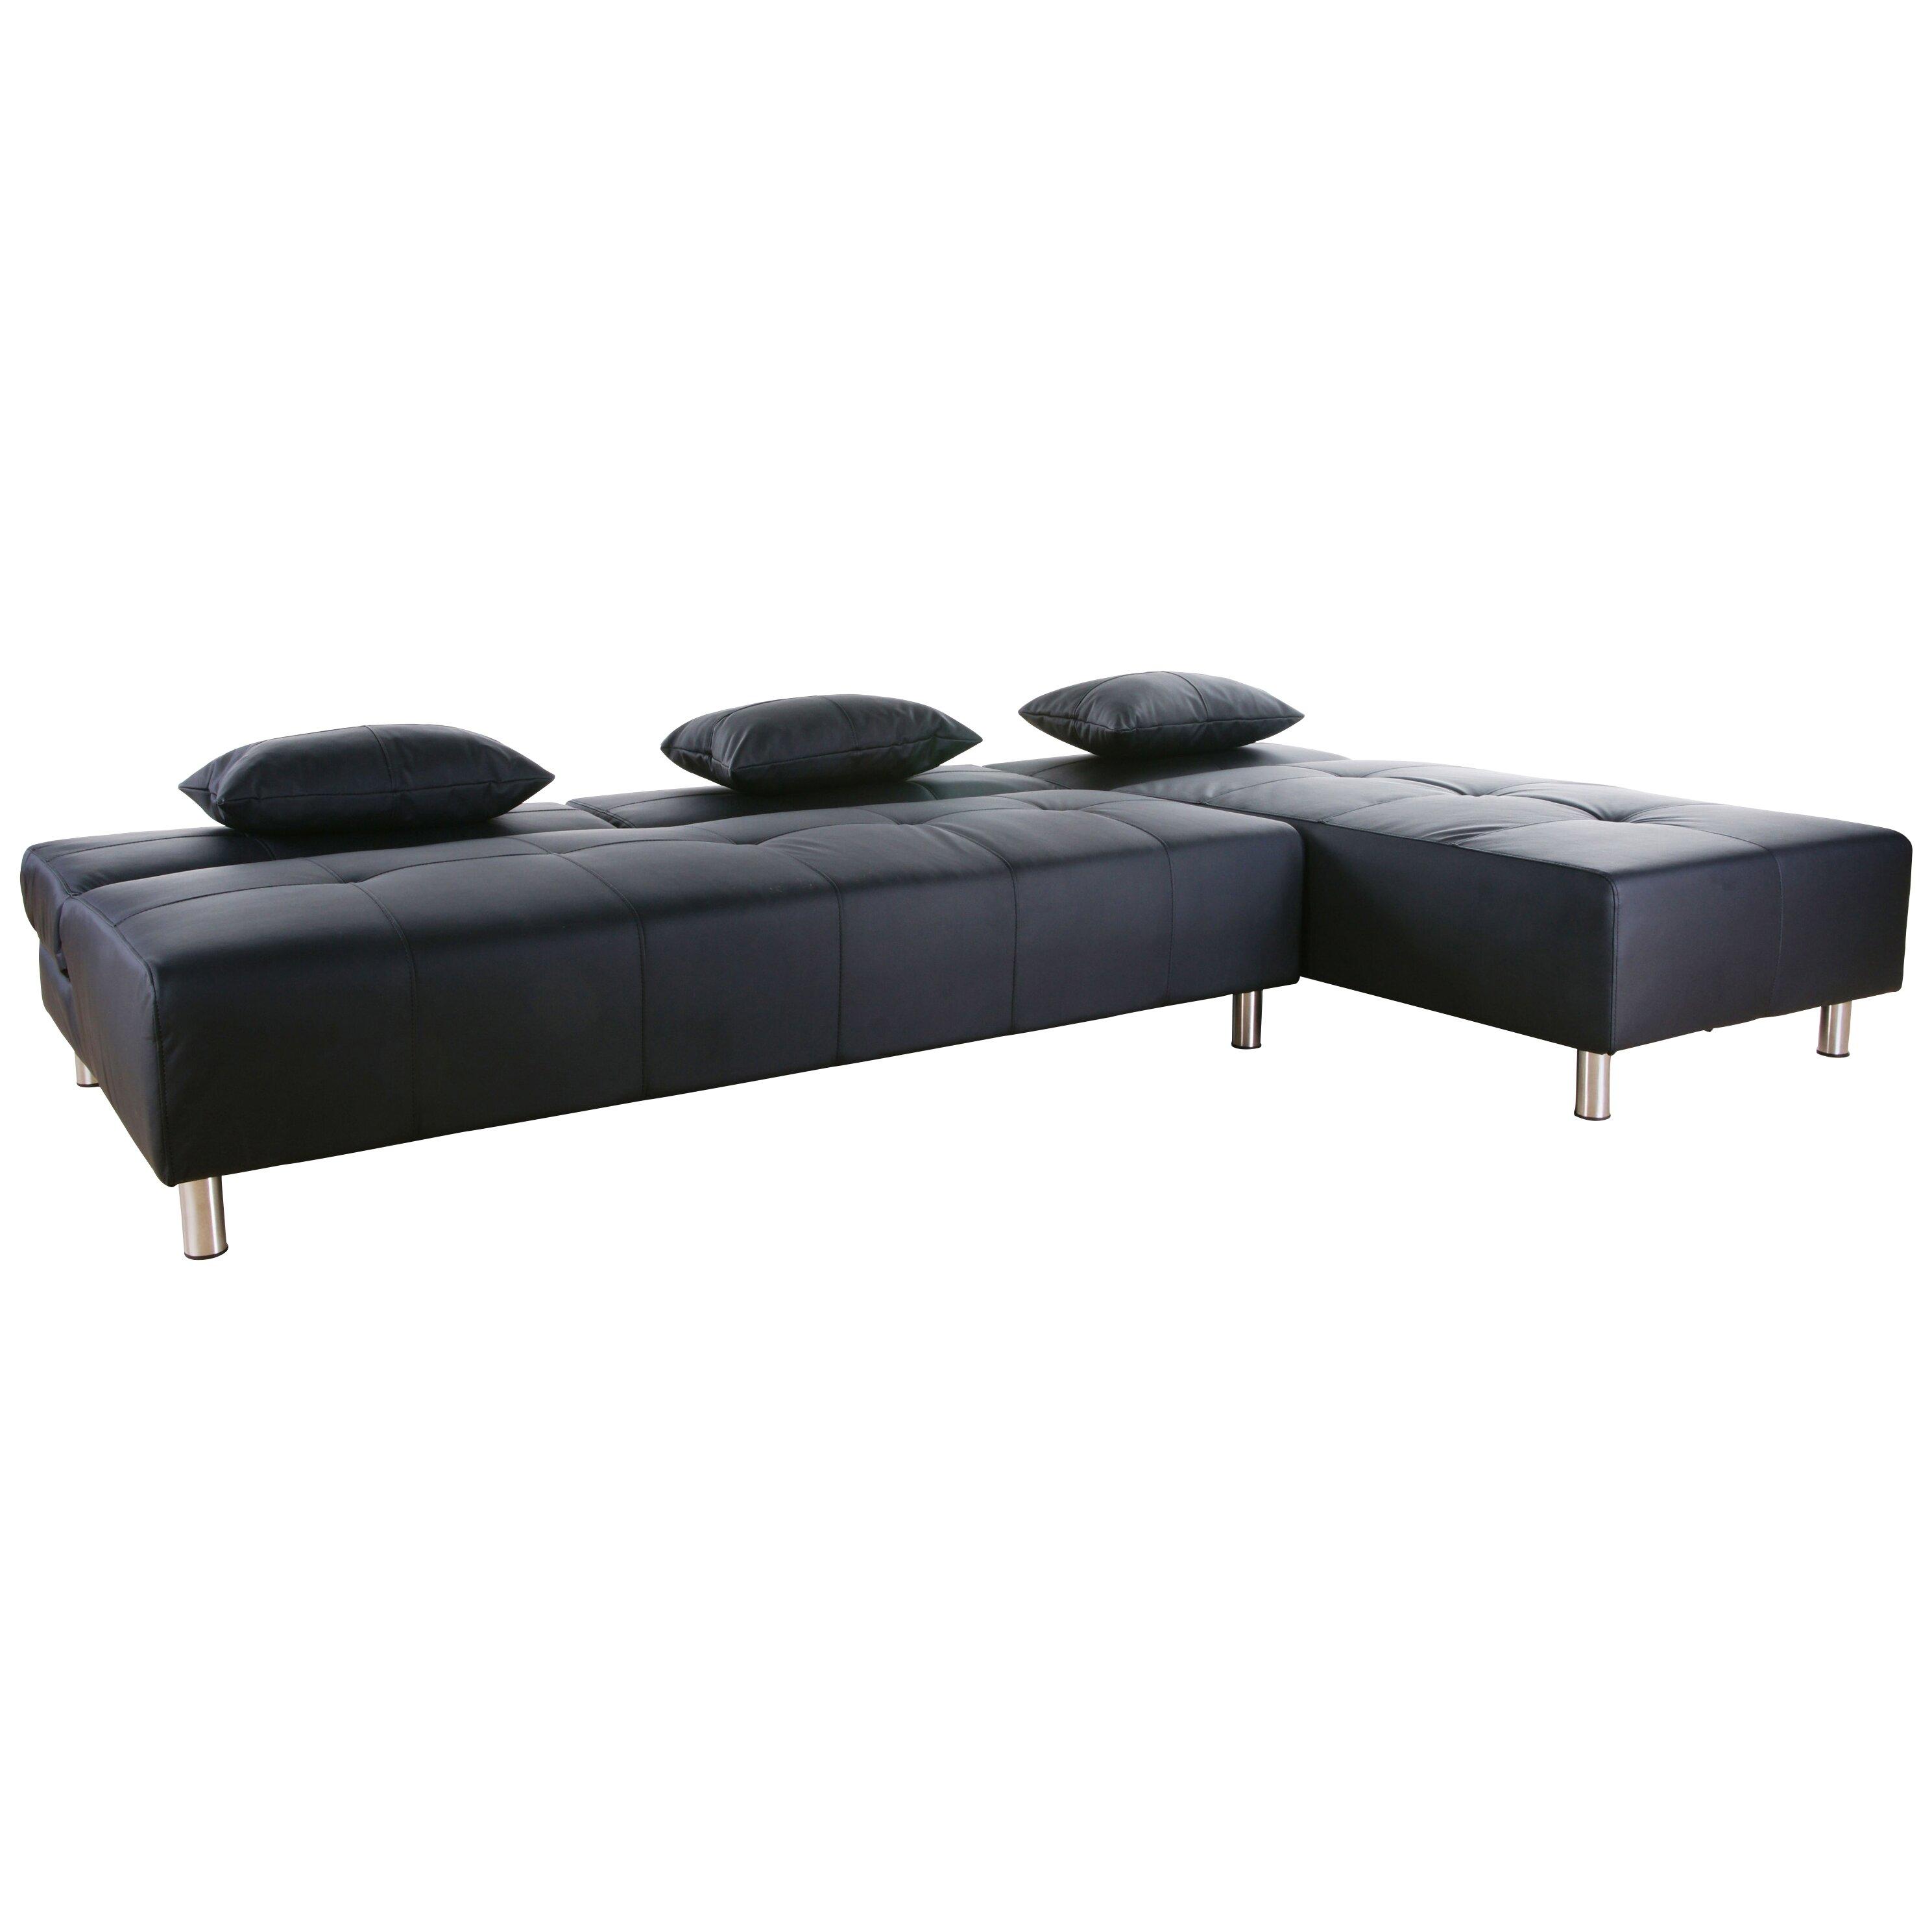 Ricardo Convertible Sectional Sofa WADL WADL